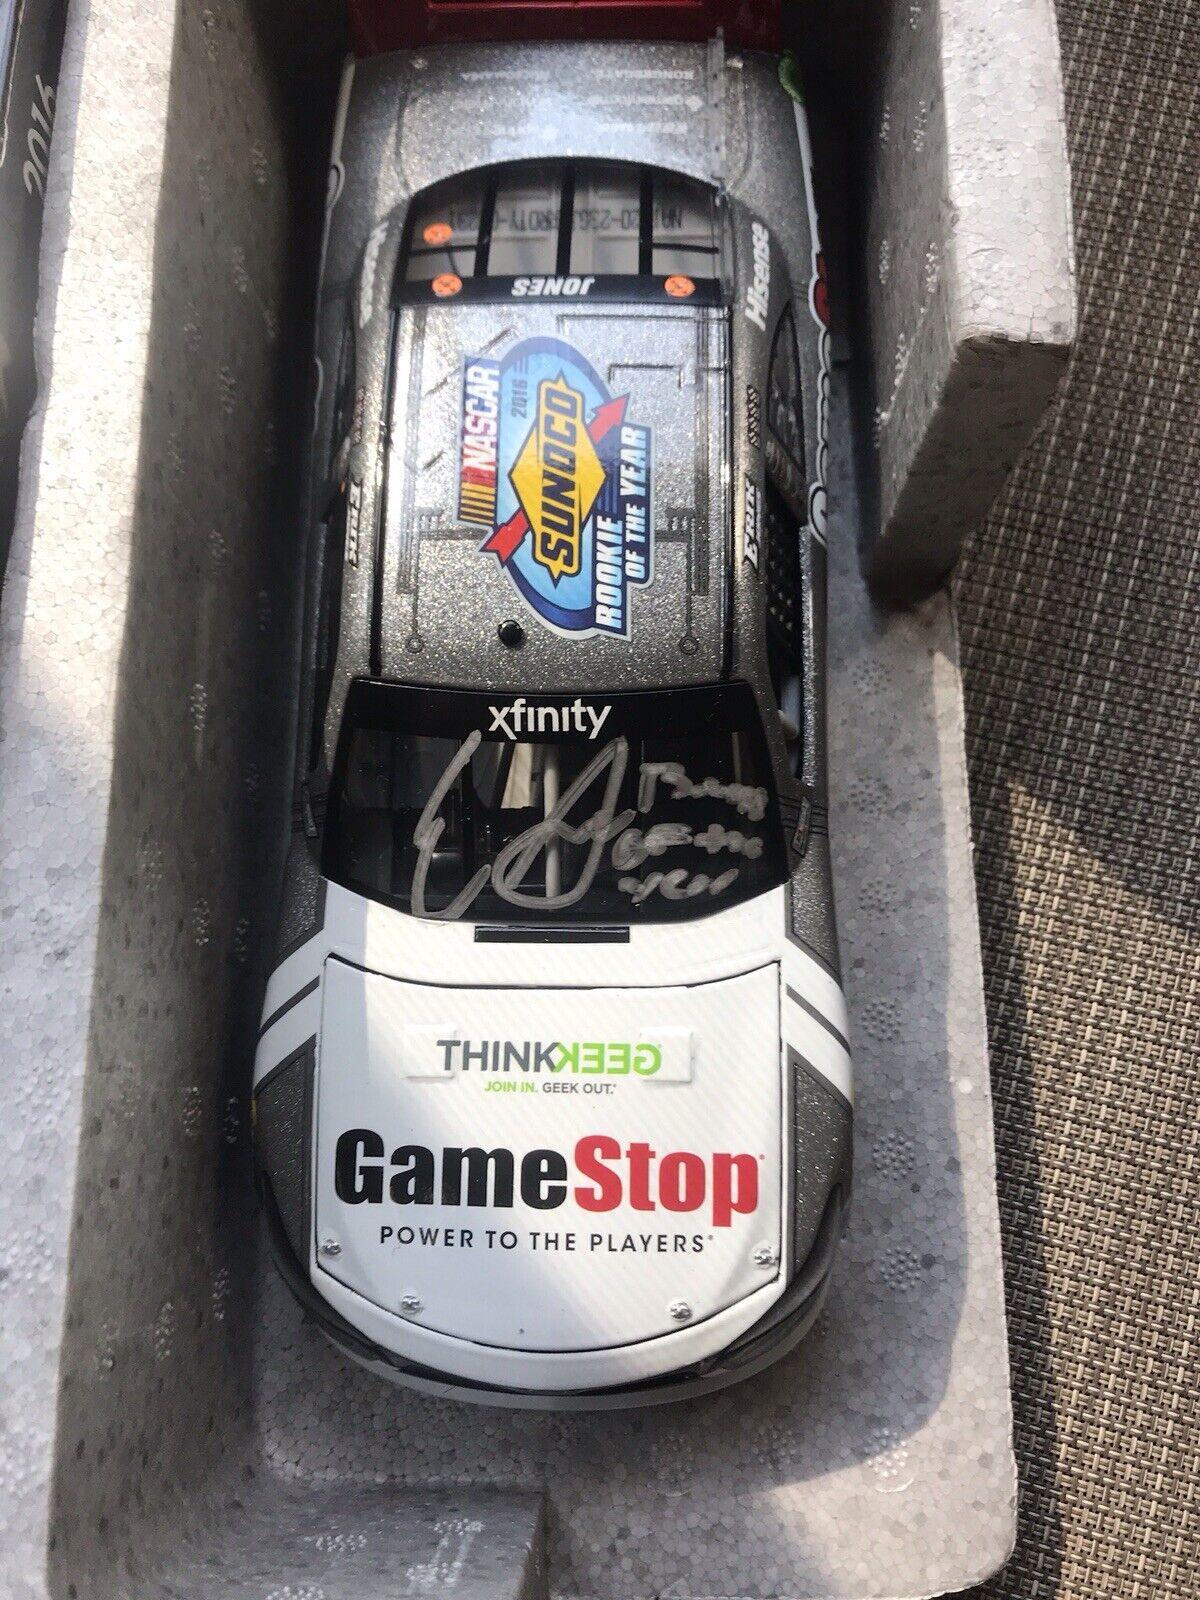 Lionel Racing Erik Jones 2016 NASCAR Xfinity Series Rookie of The Year Galaxy Finish Diecast Car 1:64